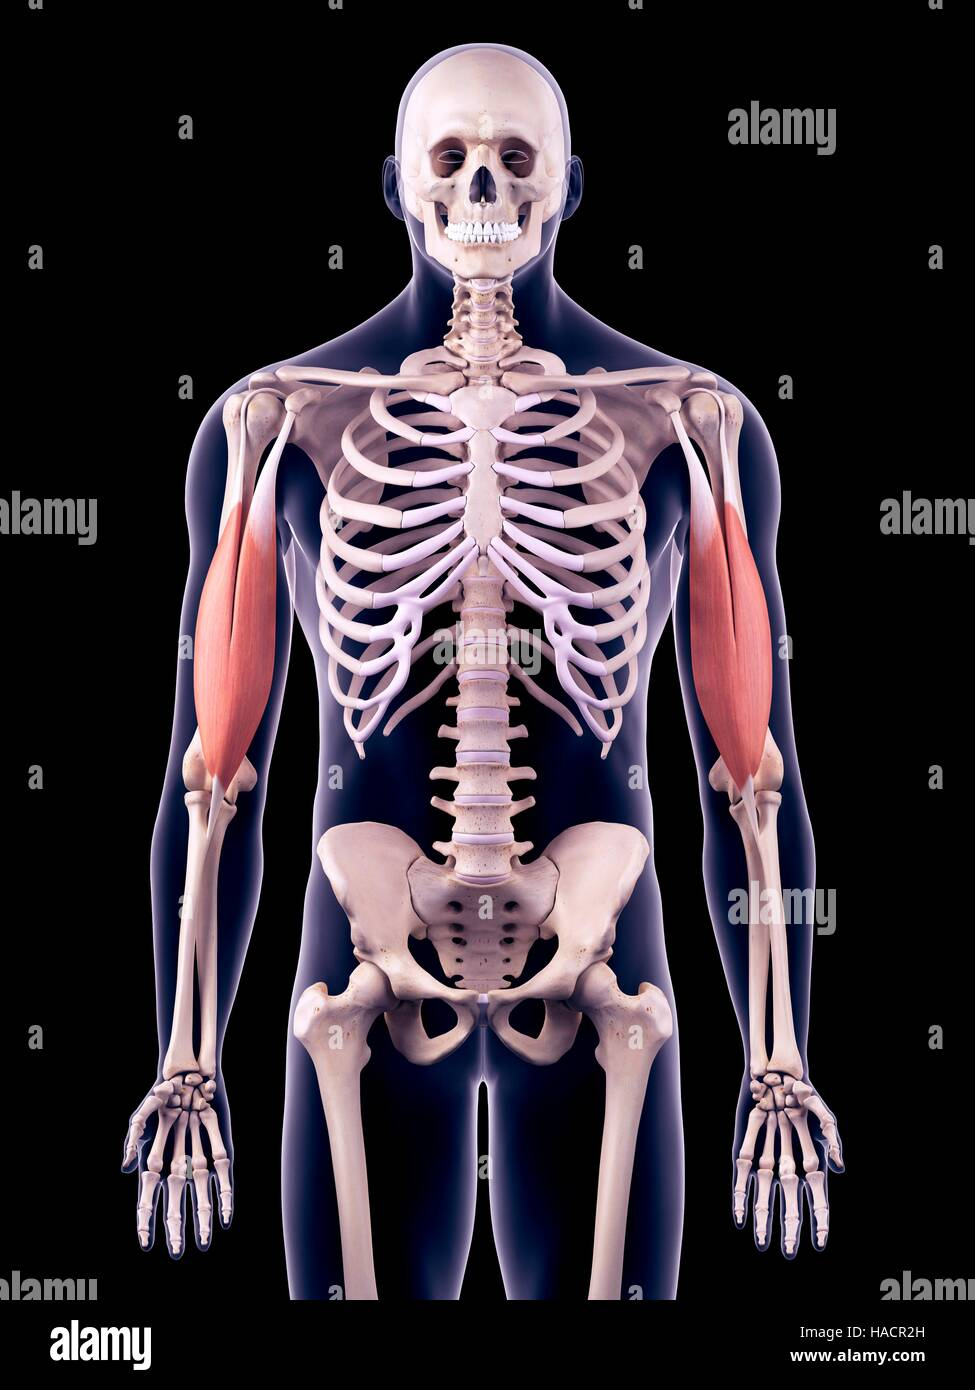 Leg Muscles Human Body Anatomy Stockfotos & Leg Muscles Human Body ...